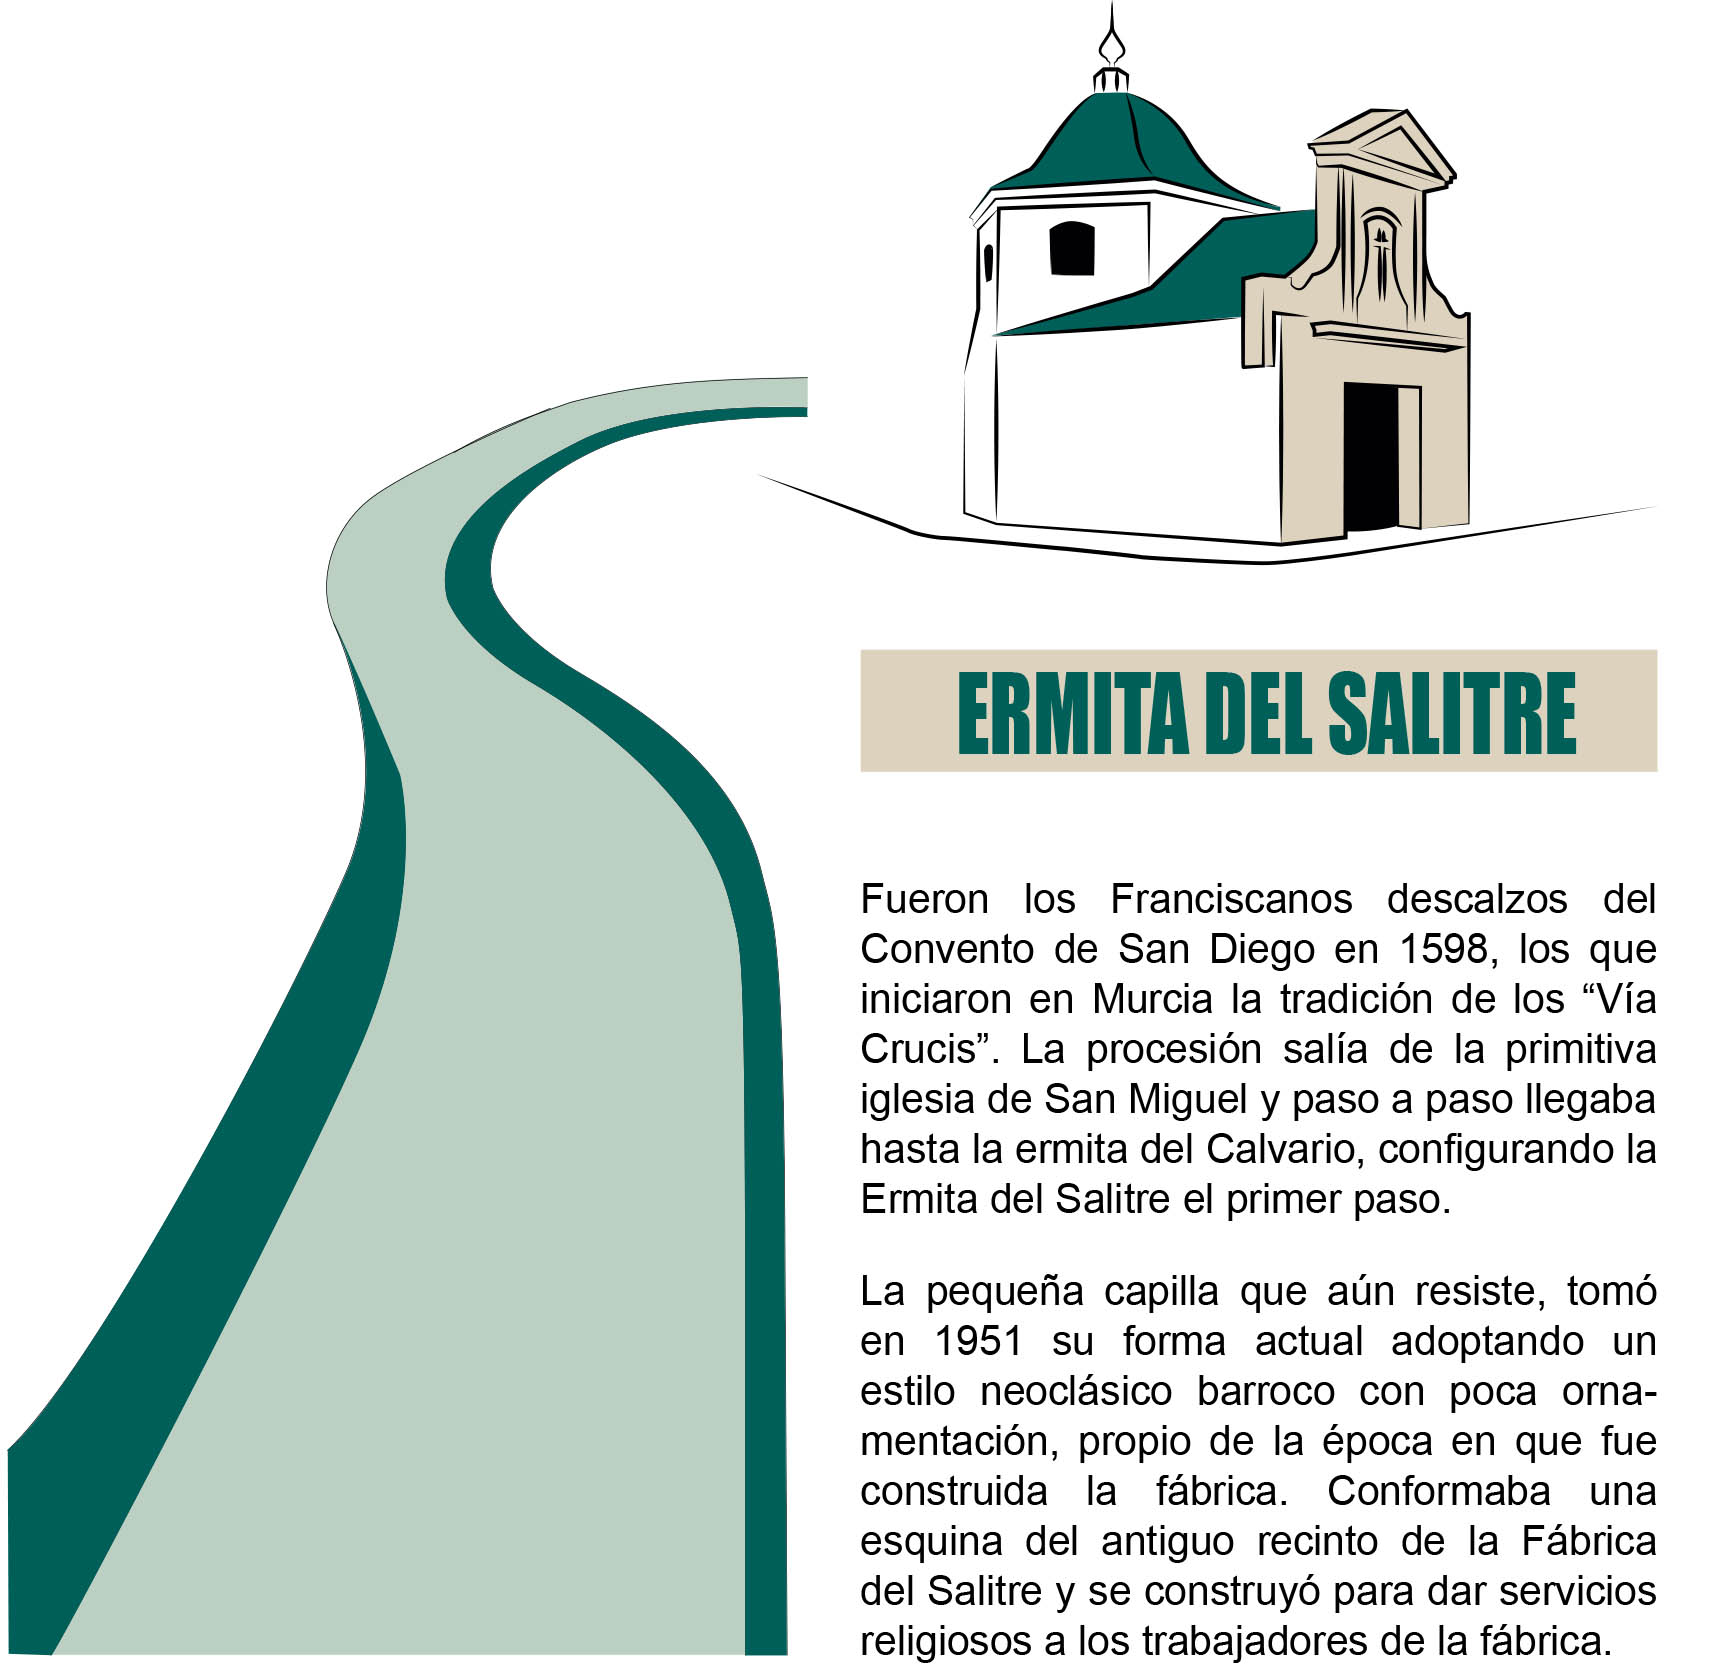 Cultura - Patrimonio - Murcia - Arquitectura de Barrio - La Calle de la Acequia